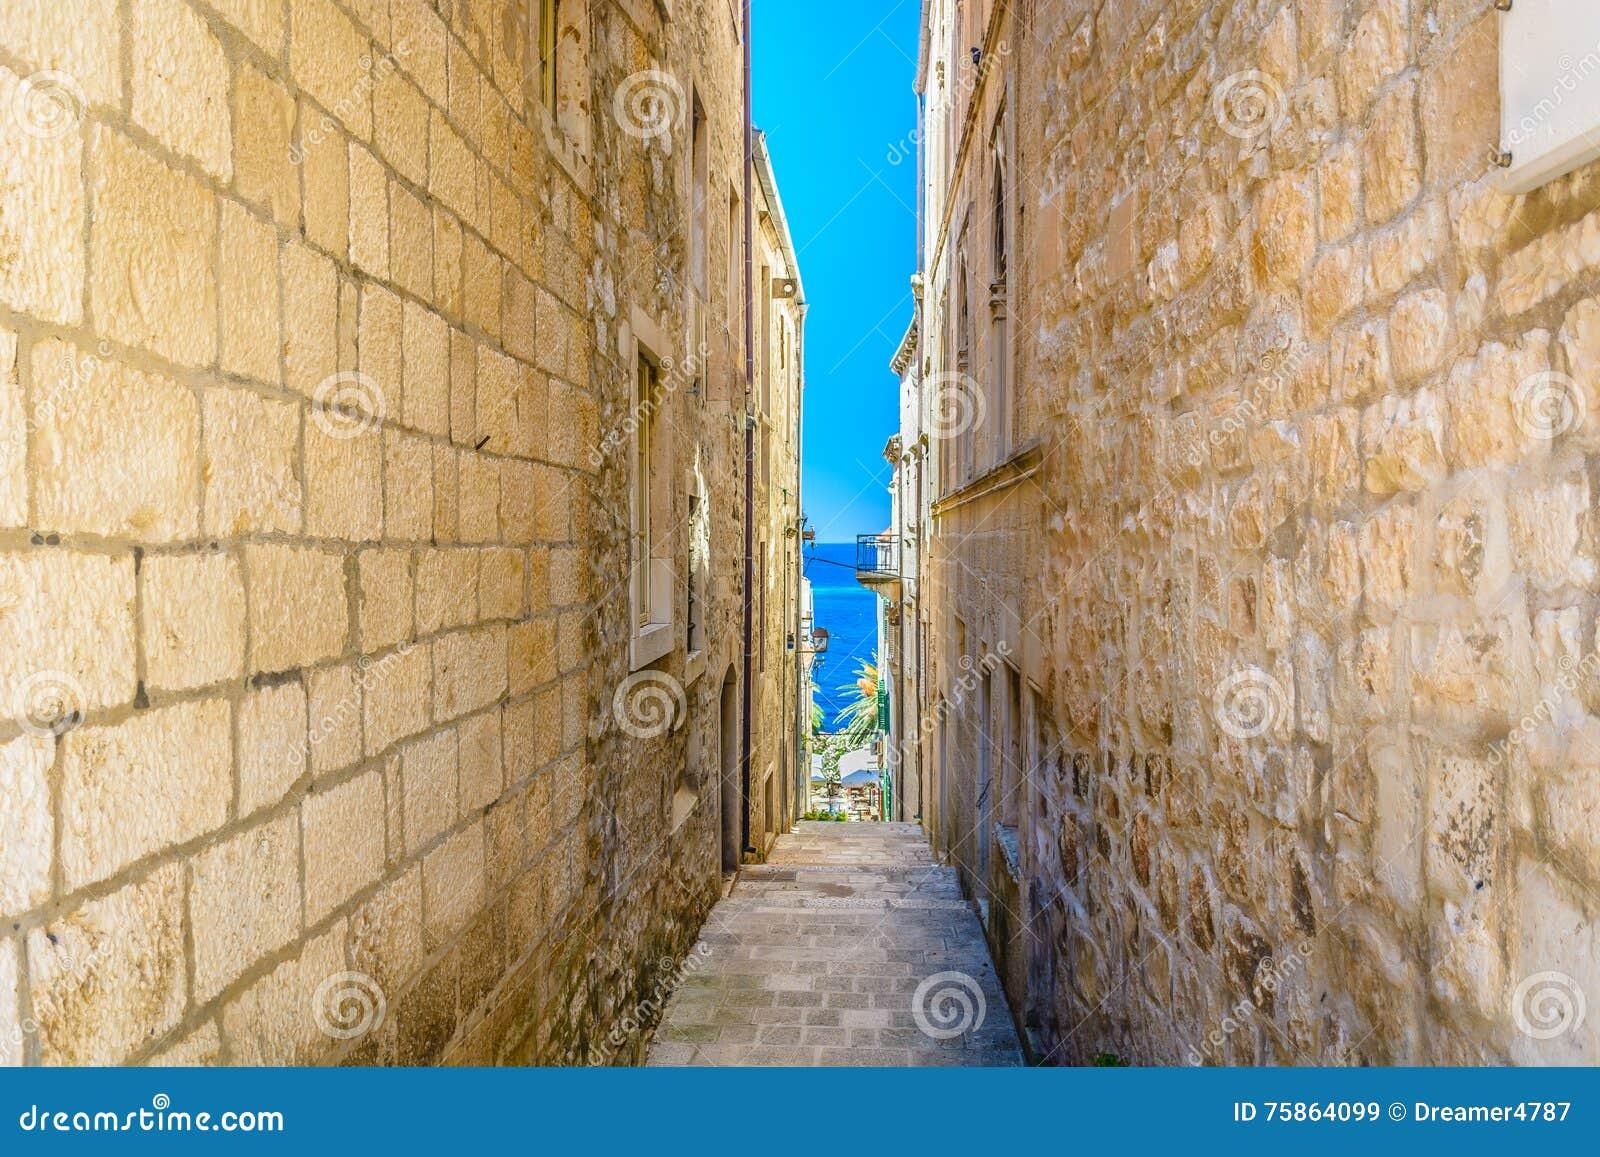 Alte schmale Mittelmeerstraße in Kroatien